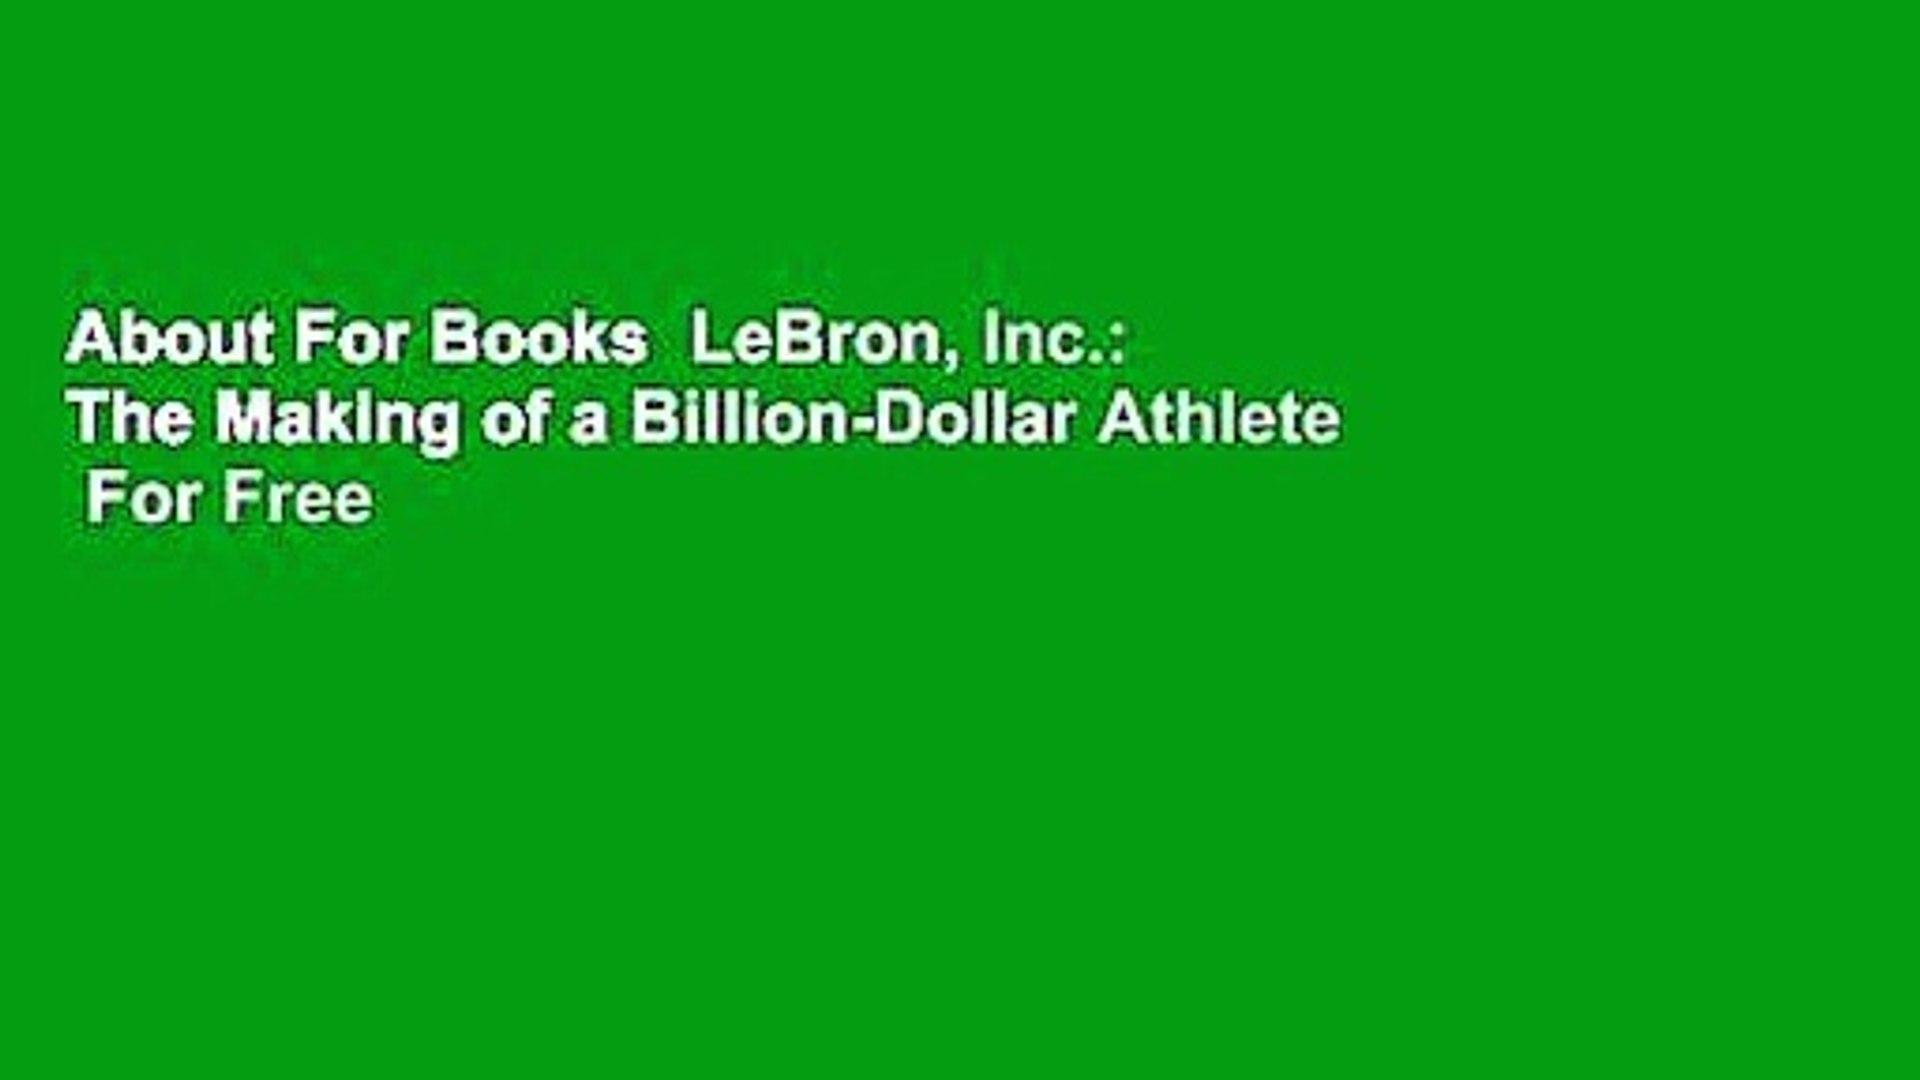 Lebron inc. pdf free download free